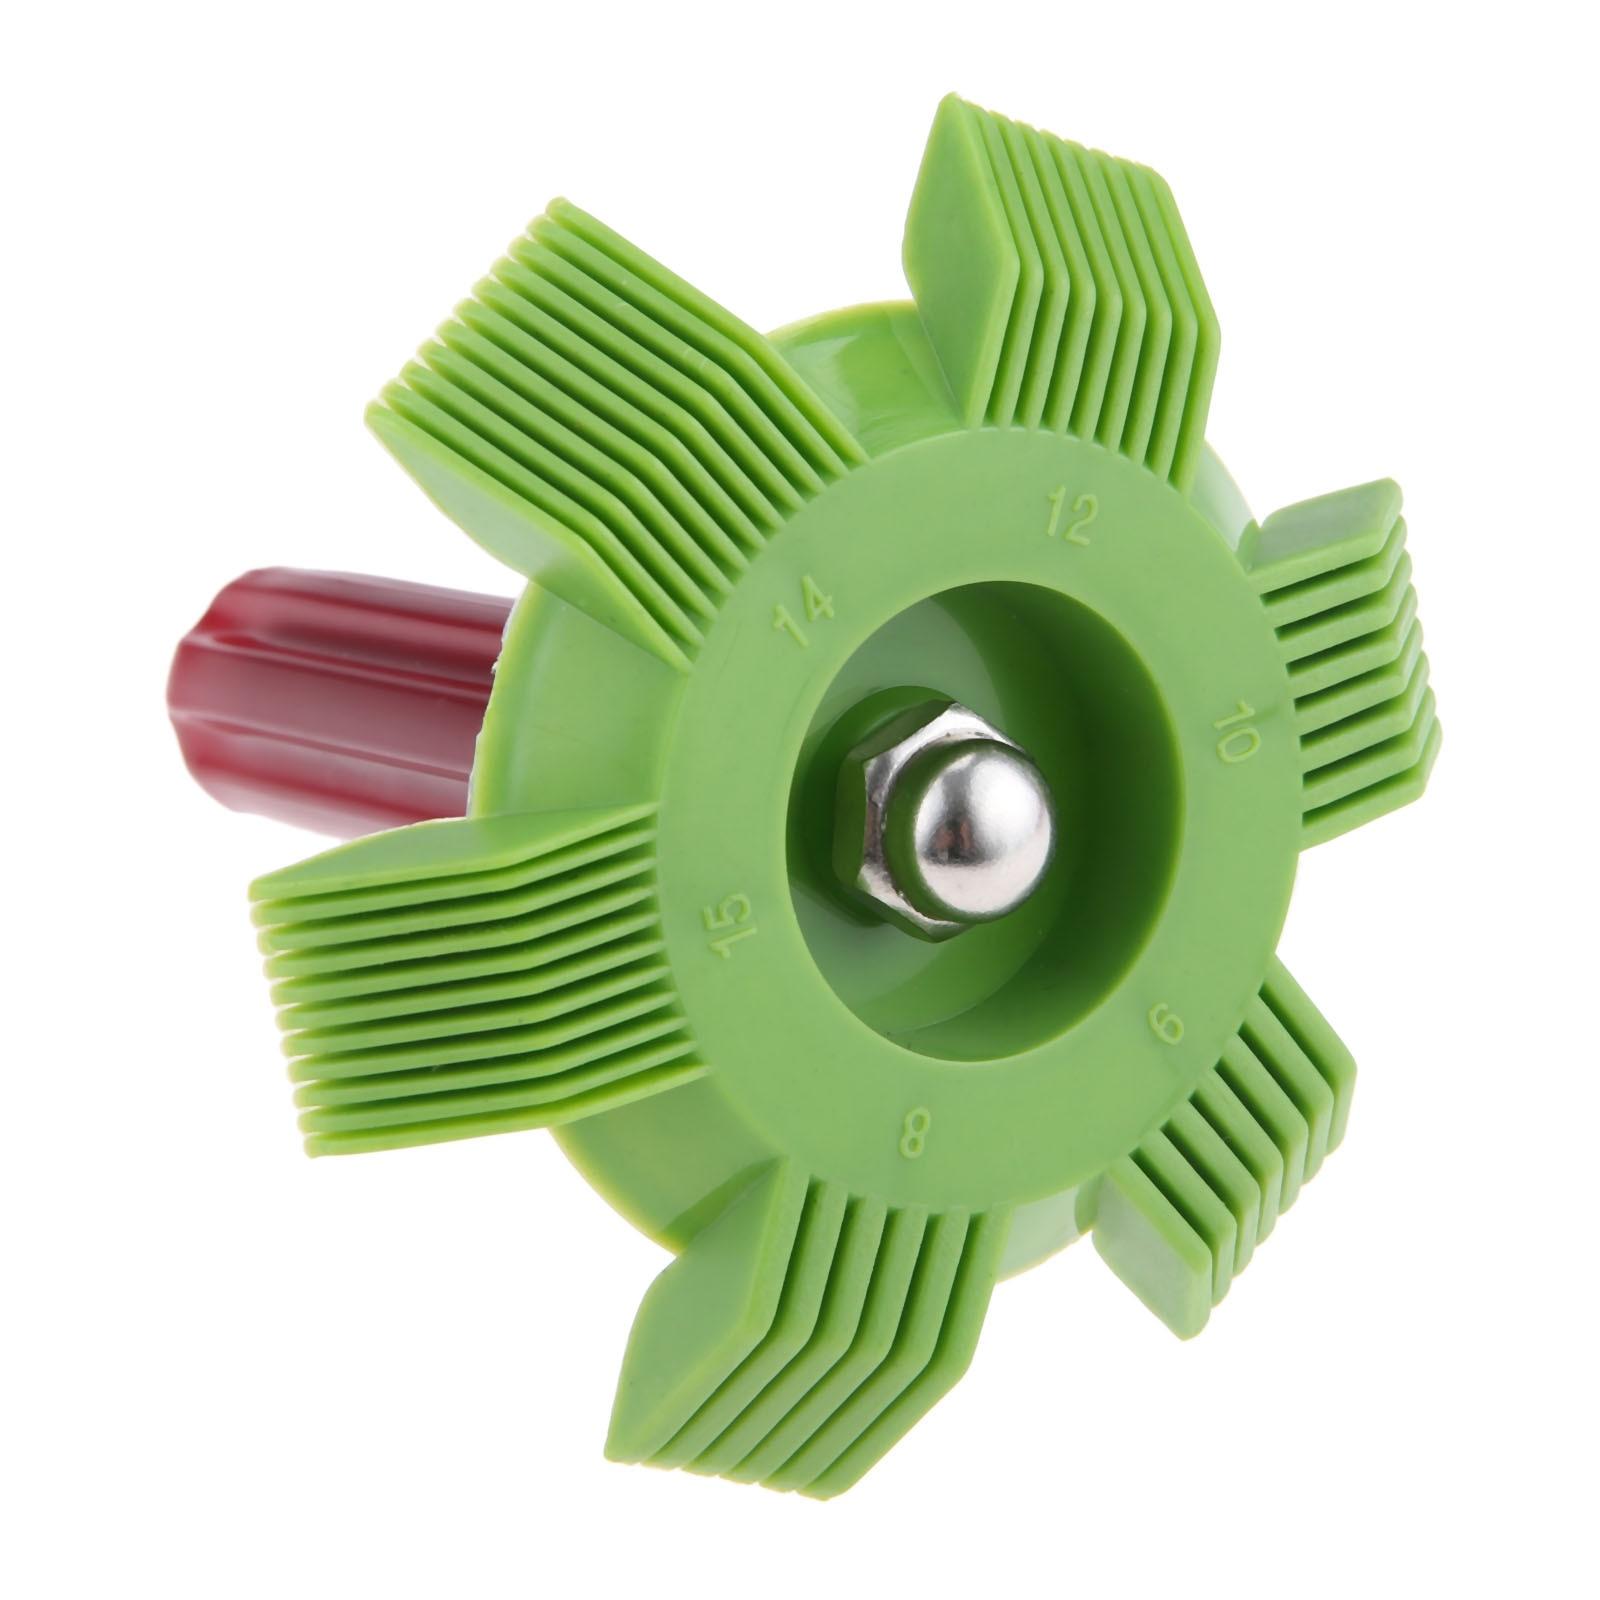 A//C Radiator Fin Straightener Cleaner Comb Rake Tool 6 8 9 10 12 14 15